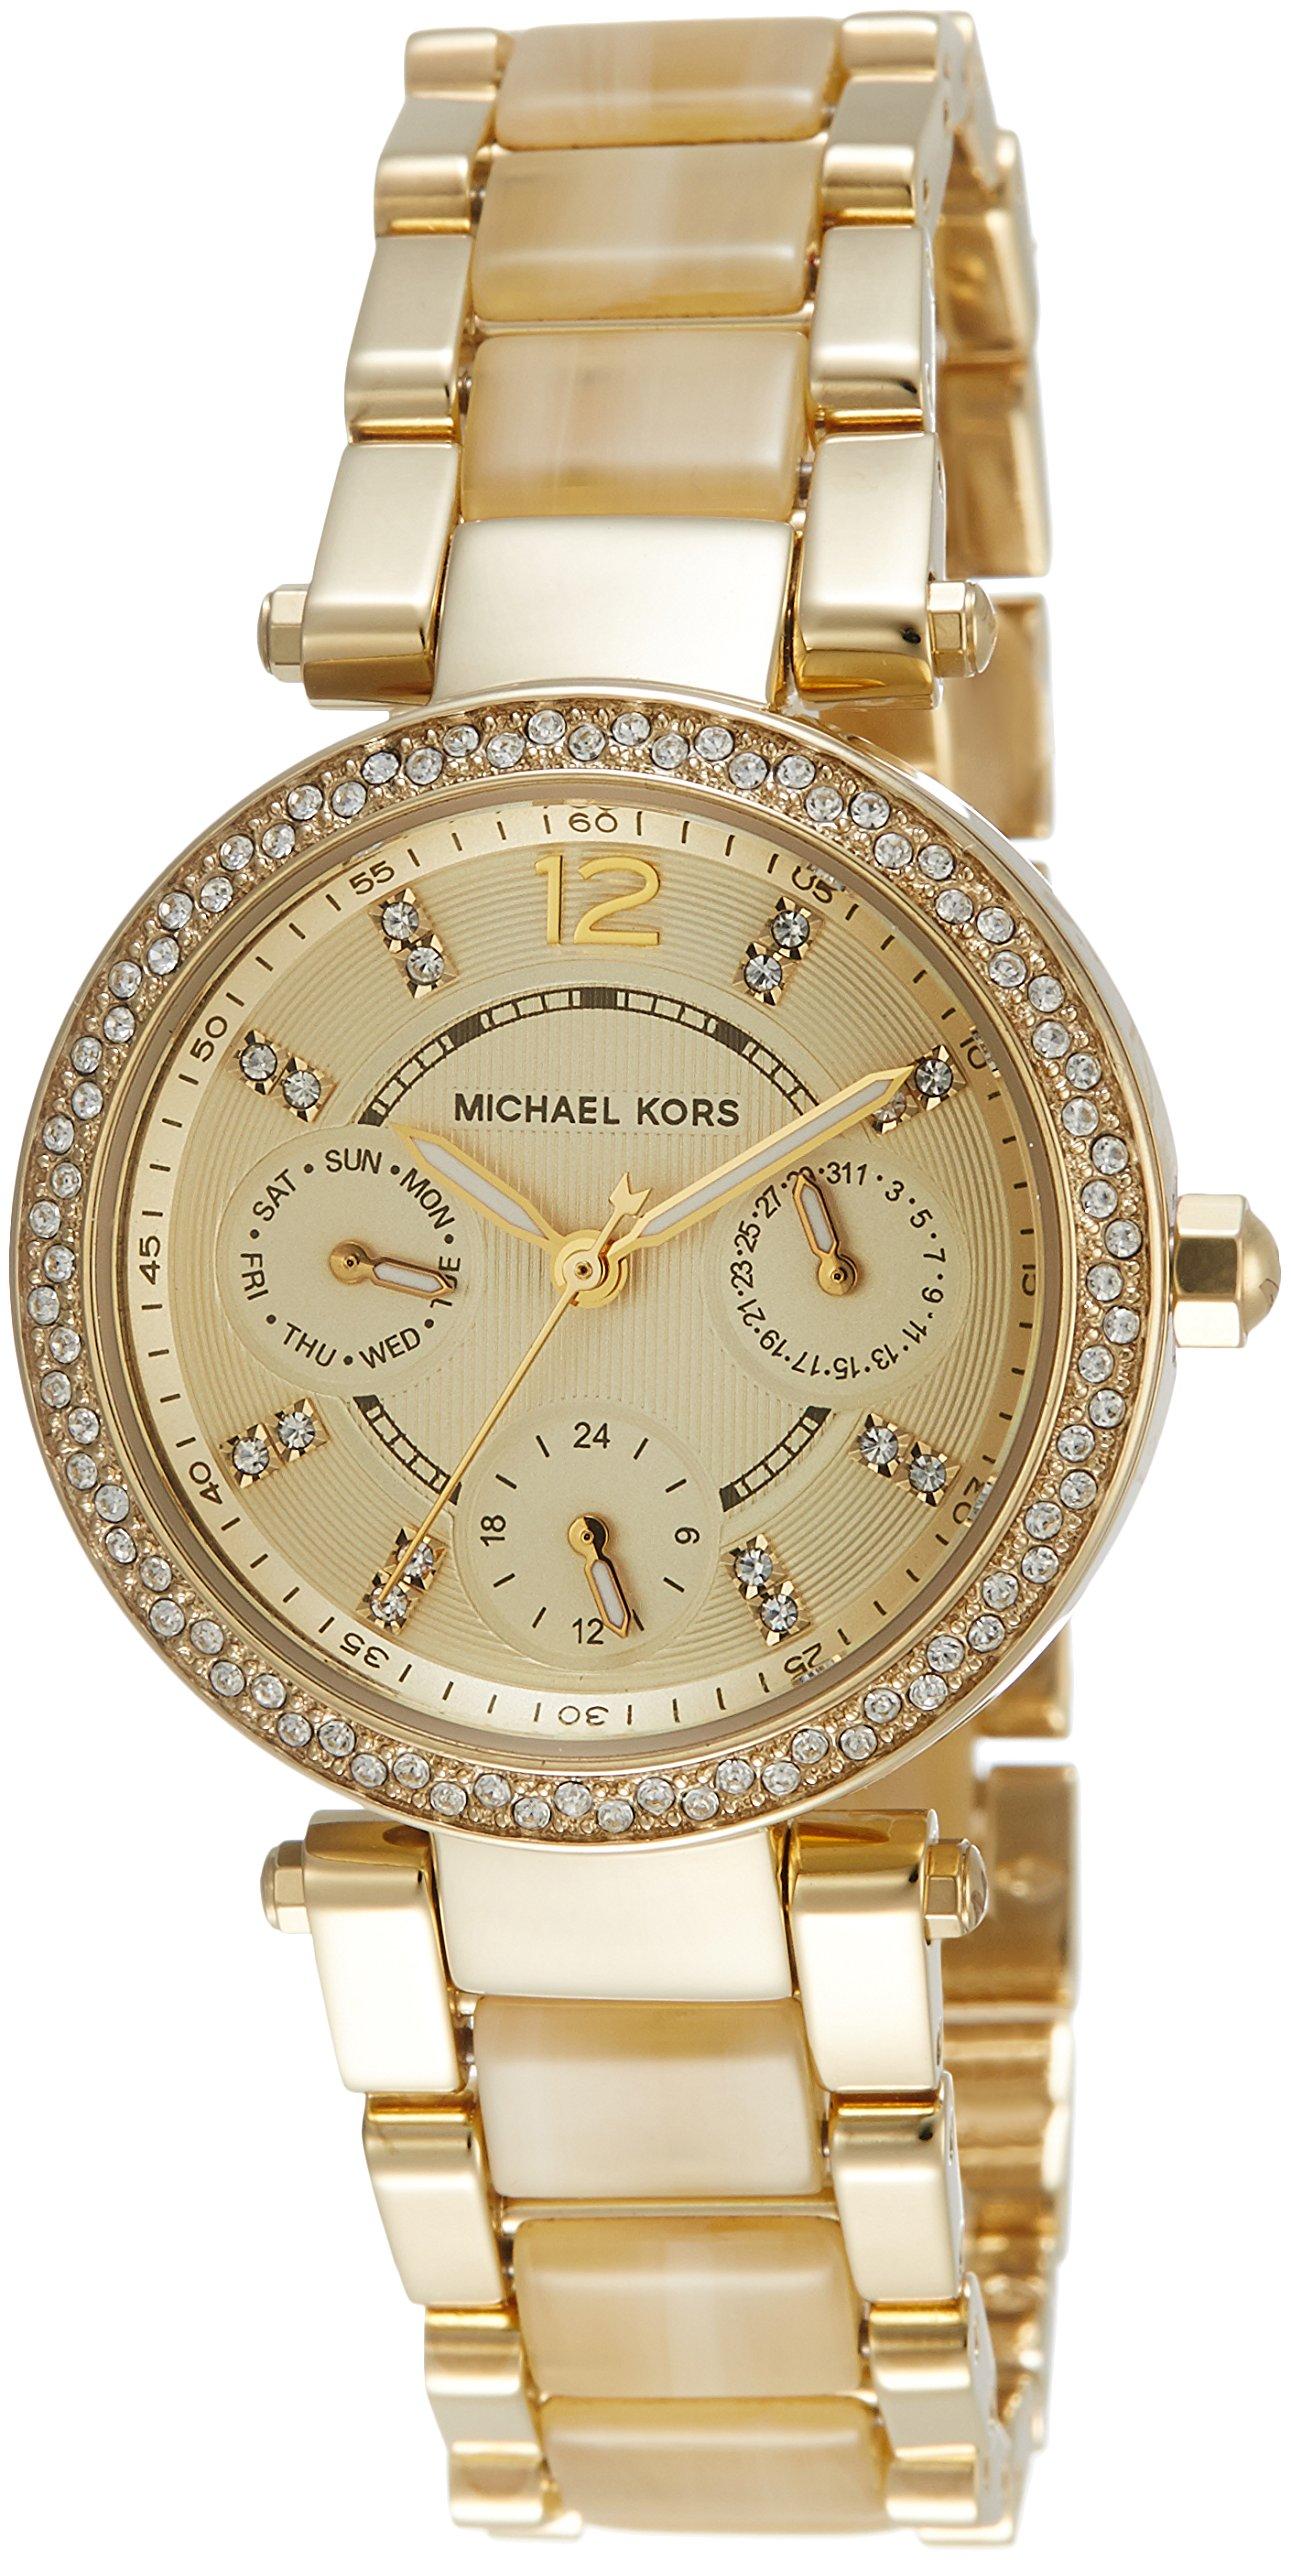 Michael Kors MK5842 Women's Watch